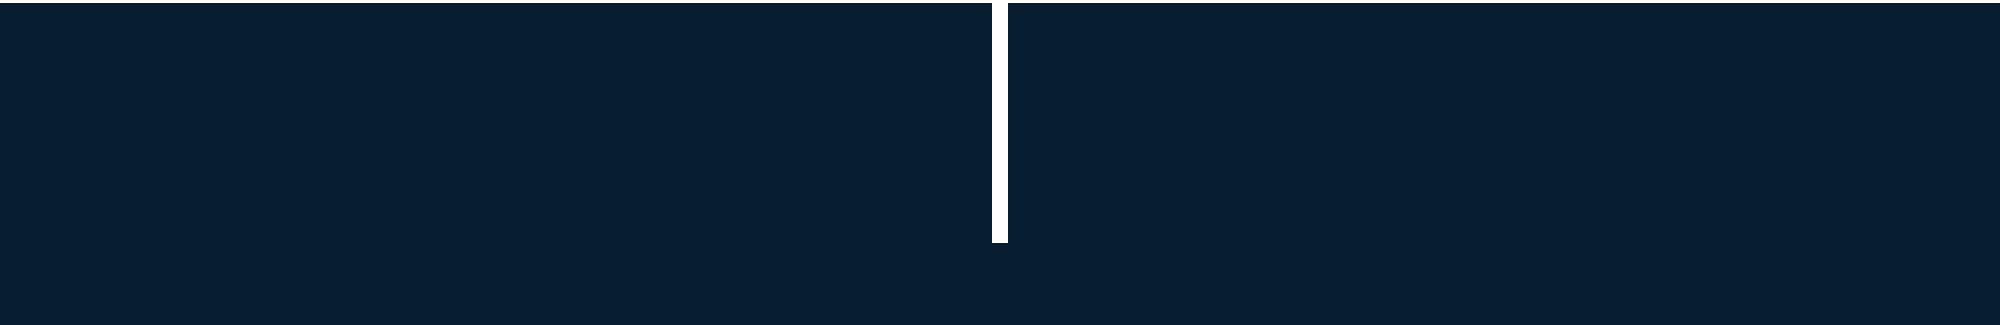 Navy Seal Logo Silhouette - Marine Soldier Silhouette